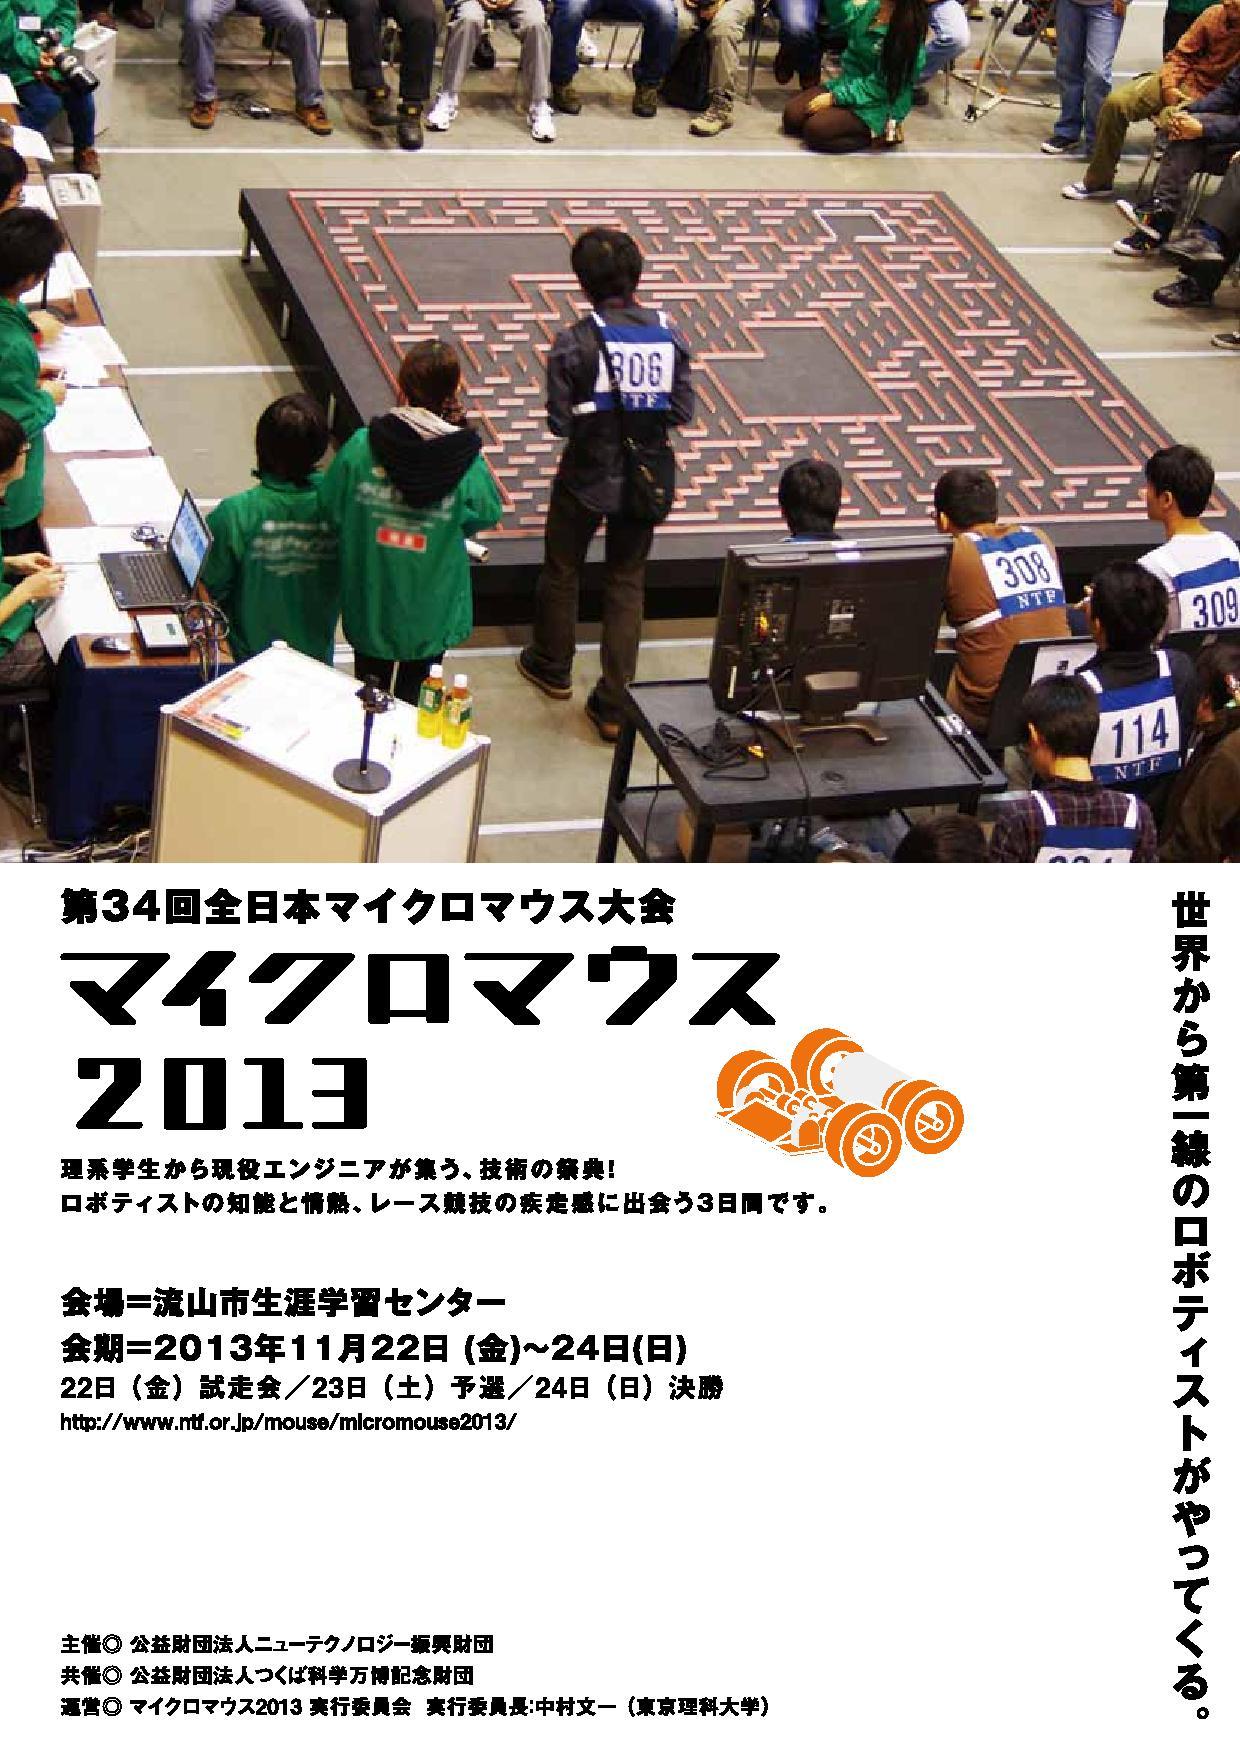 JPMM2013 poster